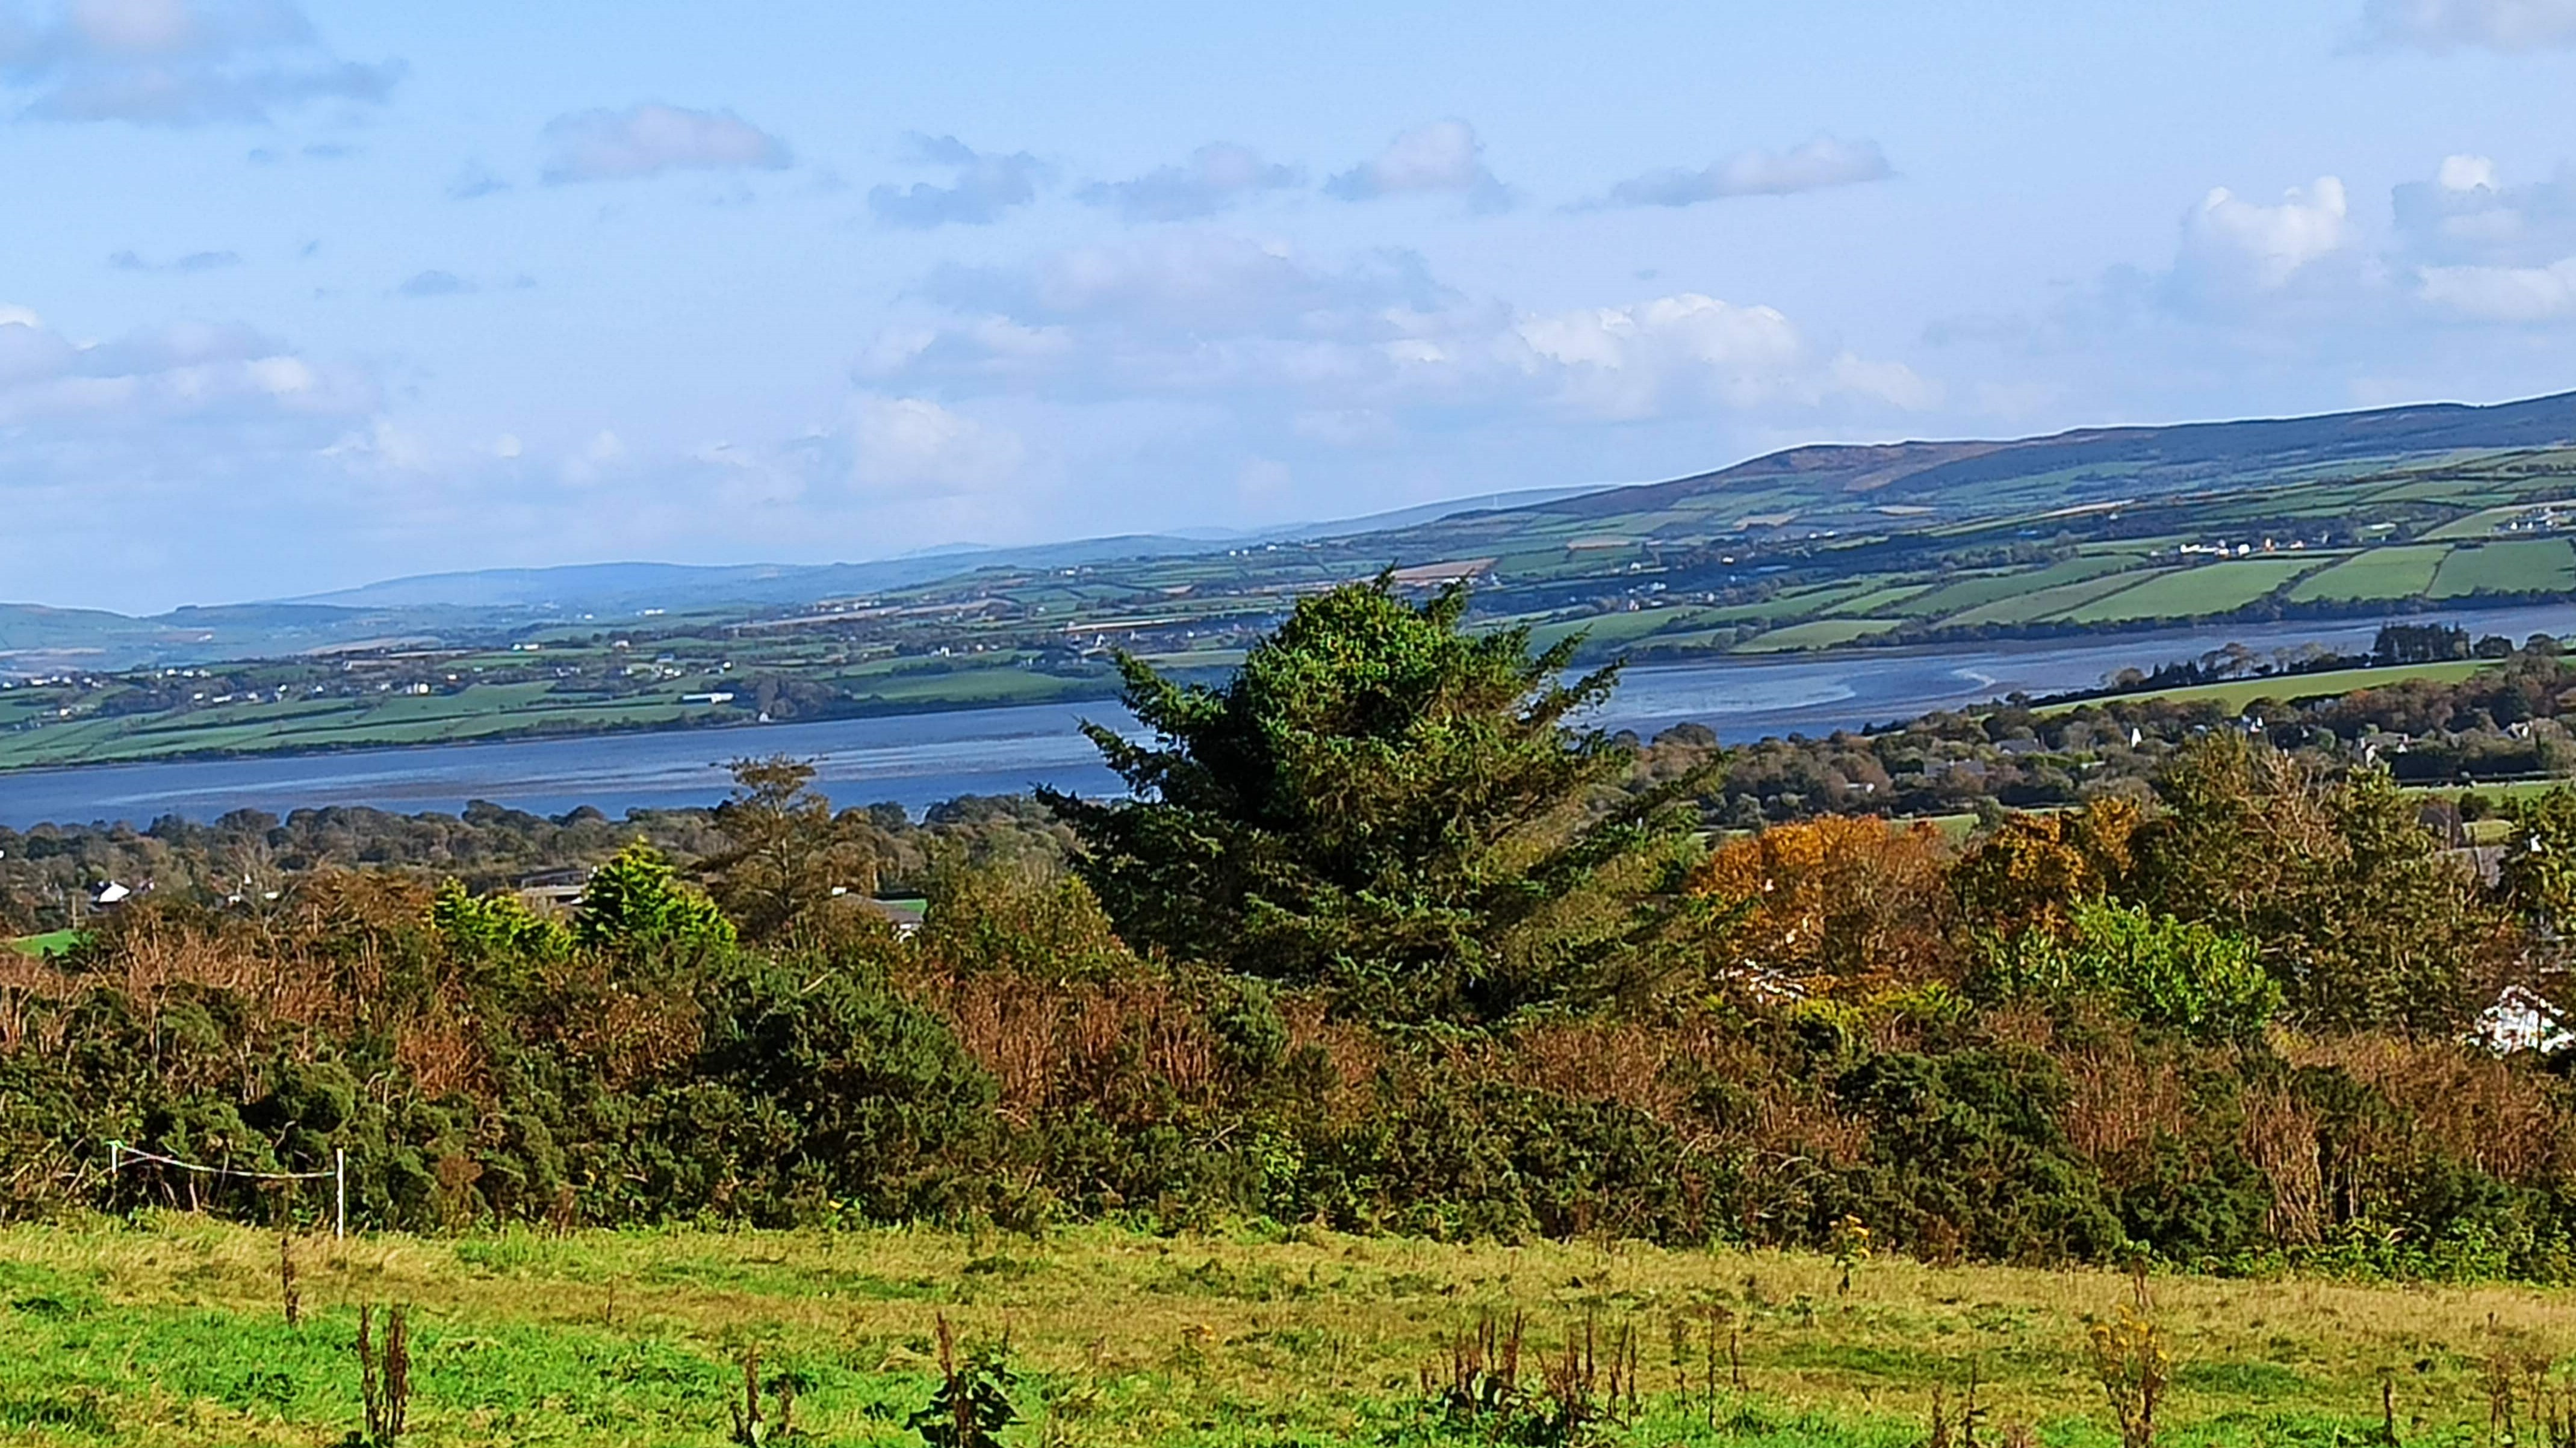 Woodlands, Letterkenny, Co. Donegal